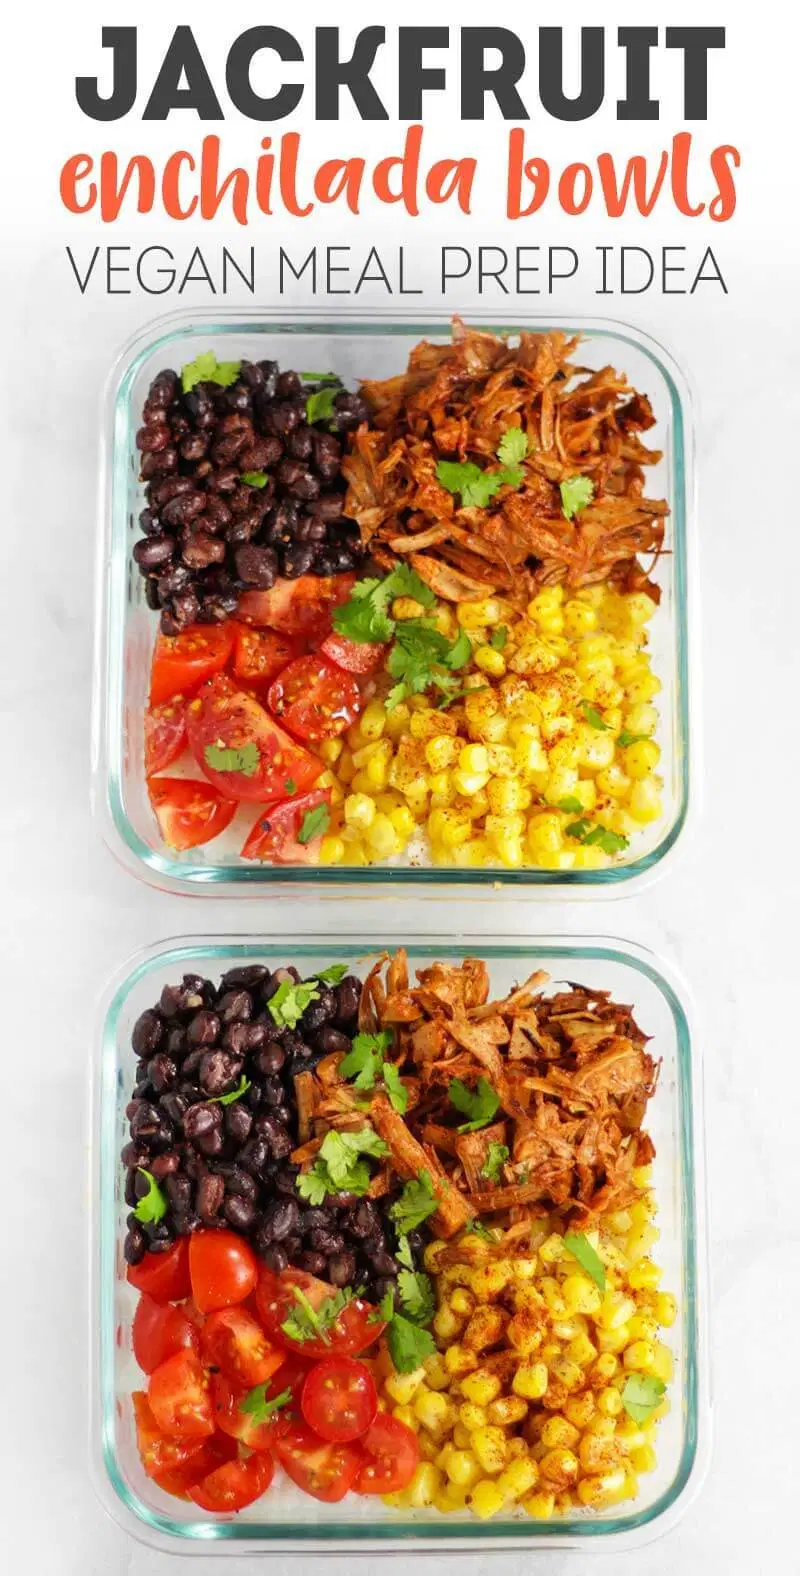 Jackfruit Enchilada Bowls | Karissa's Vegan Kitchen